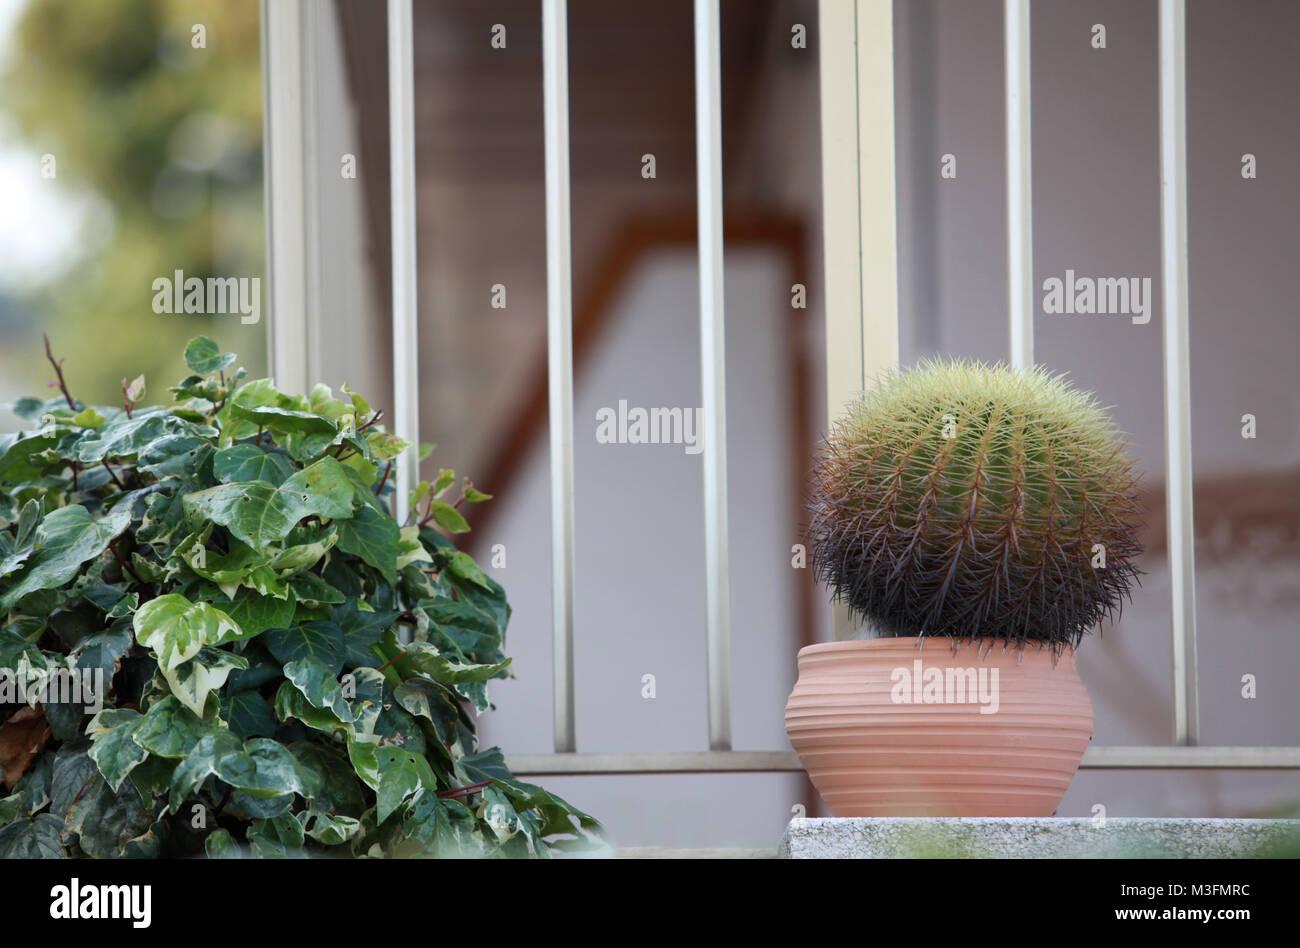 Kaktus Im Topf Auf Der Fensterbank Stockfoto Bild 174293264 Alamy